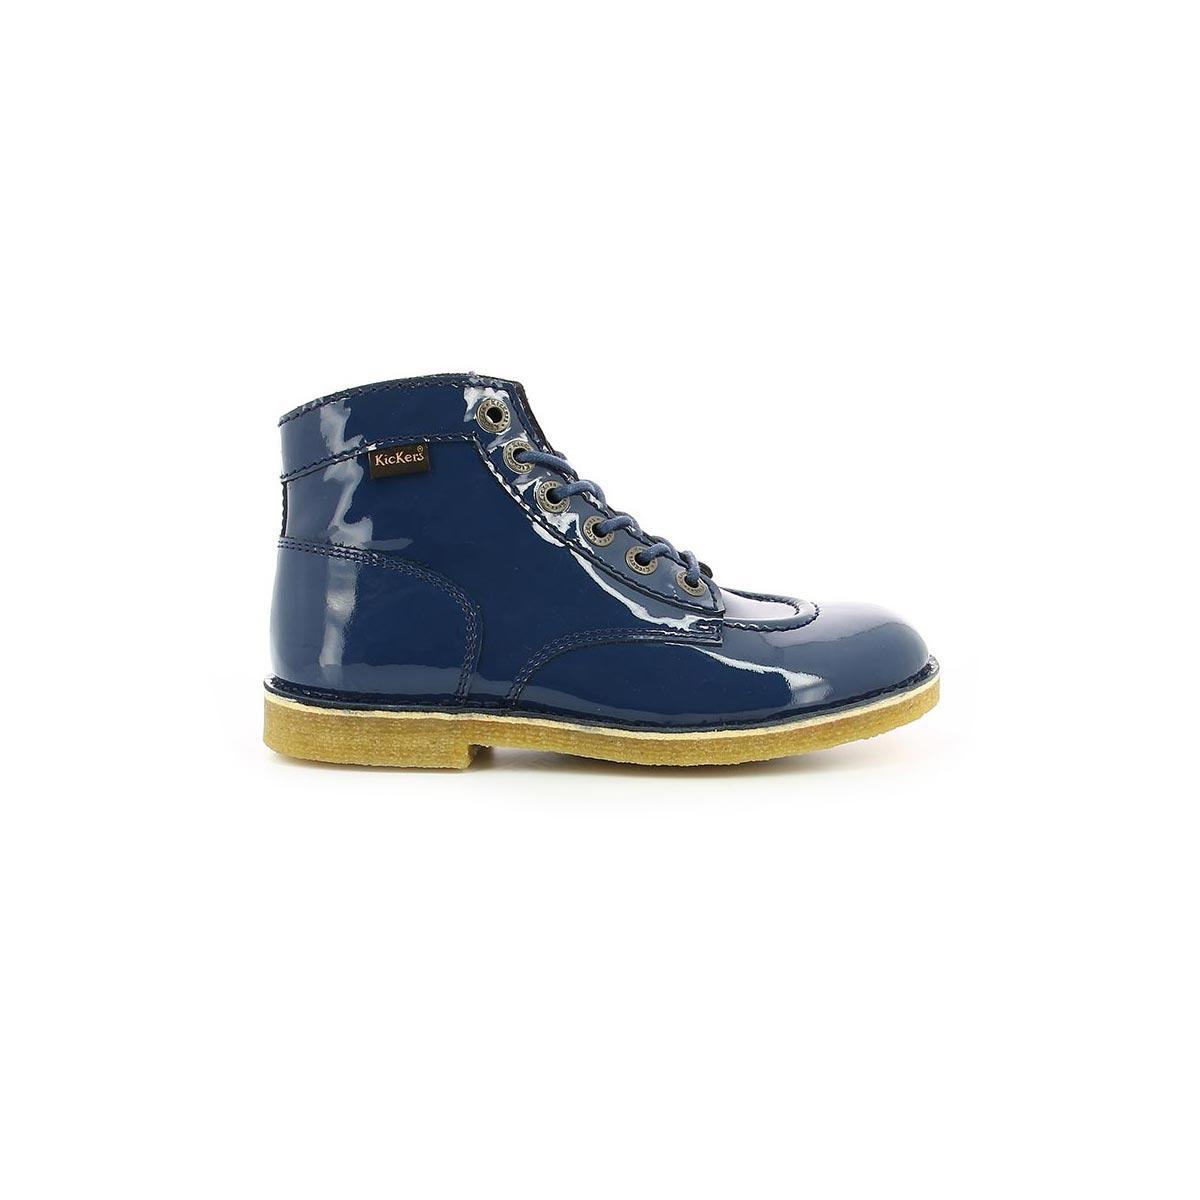 9f8d42e7e1ff2c Chaussures Femme KICK LEGEND MARINE VERNIS - Kickers